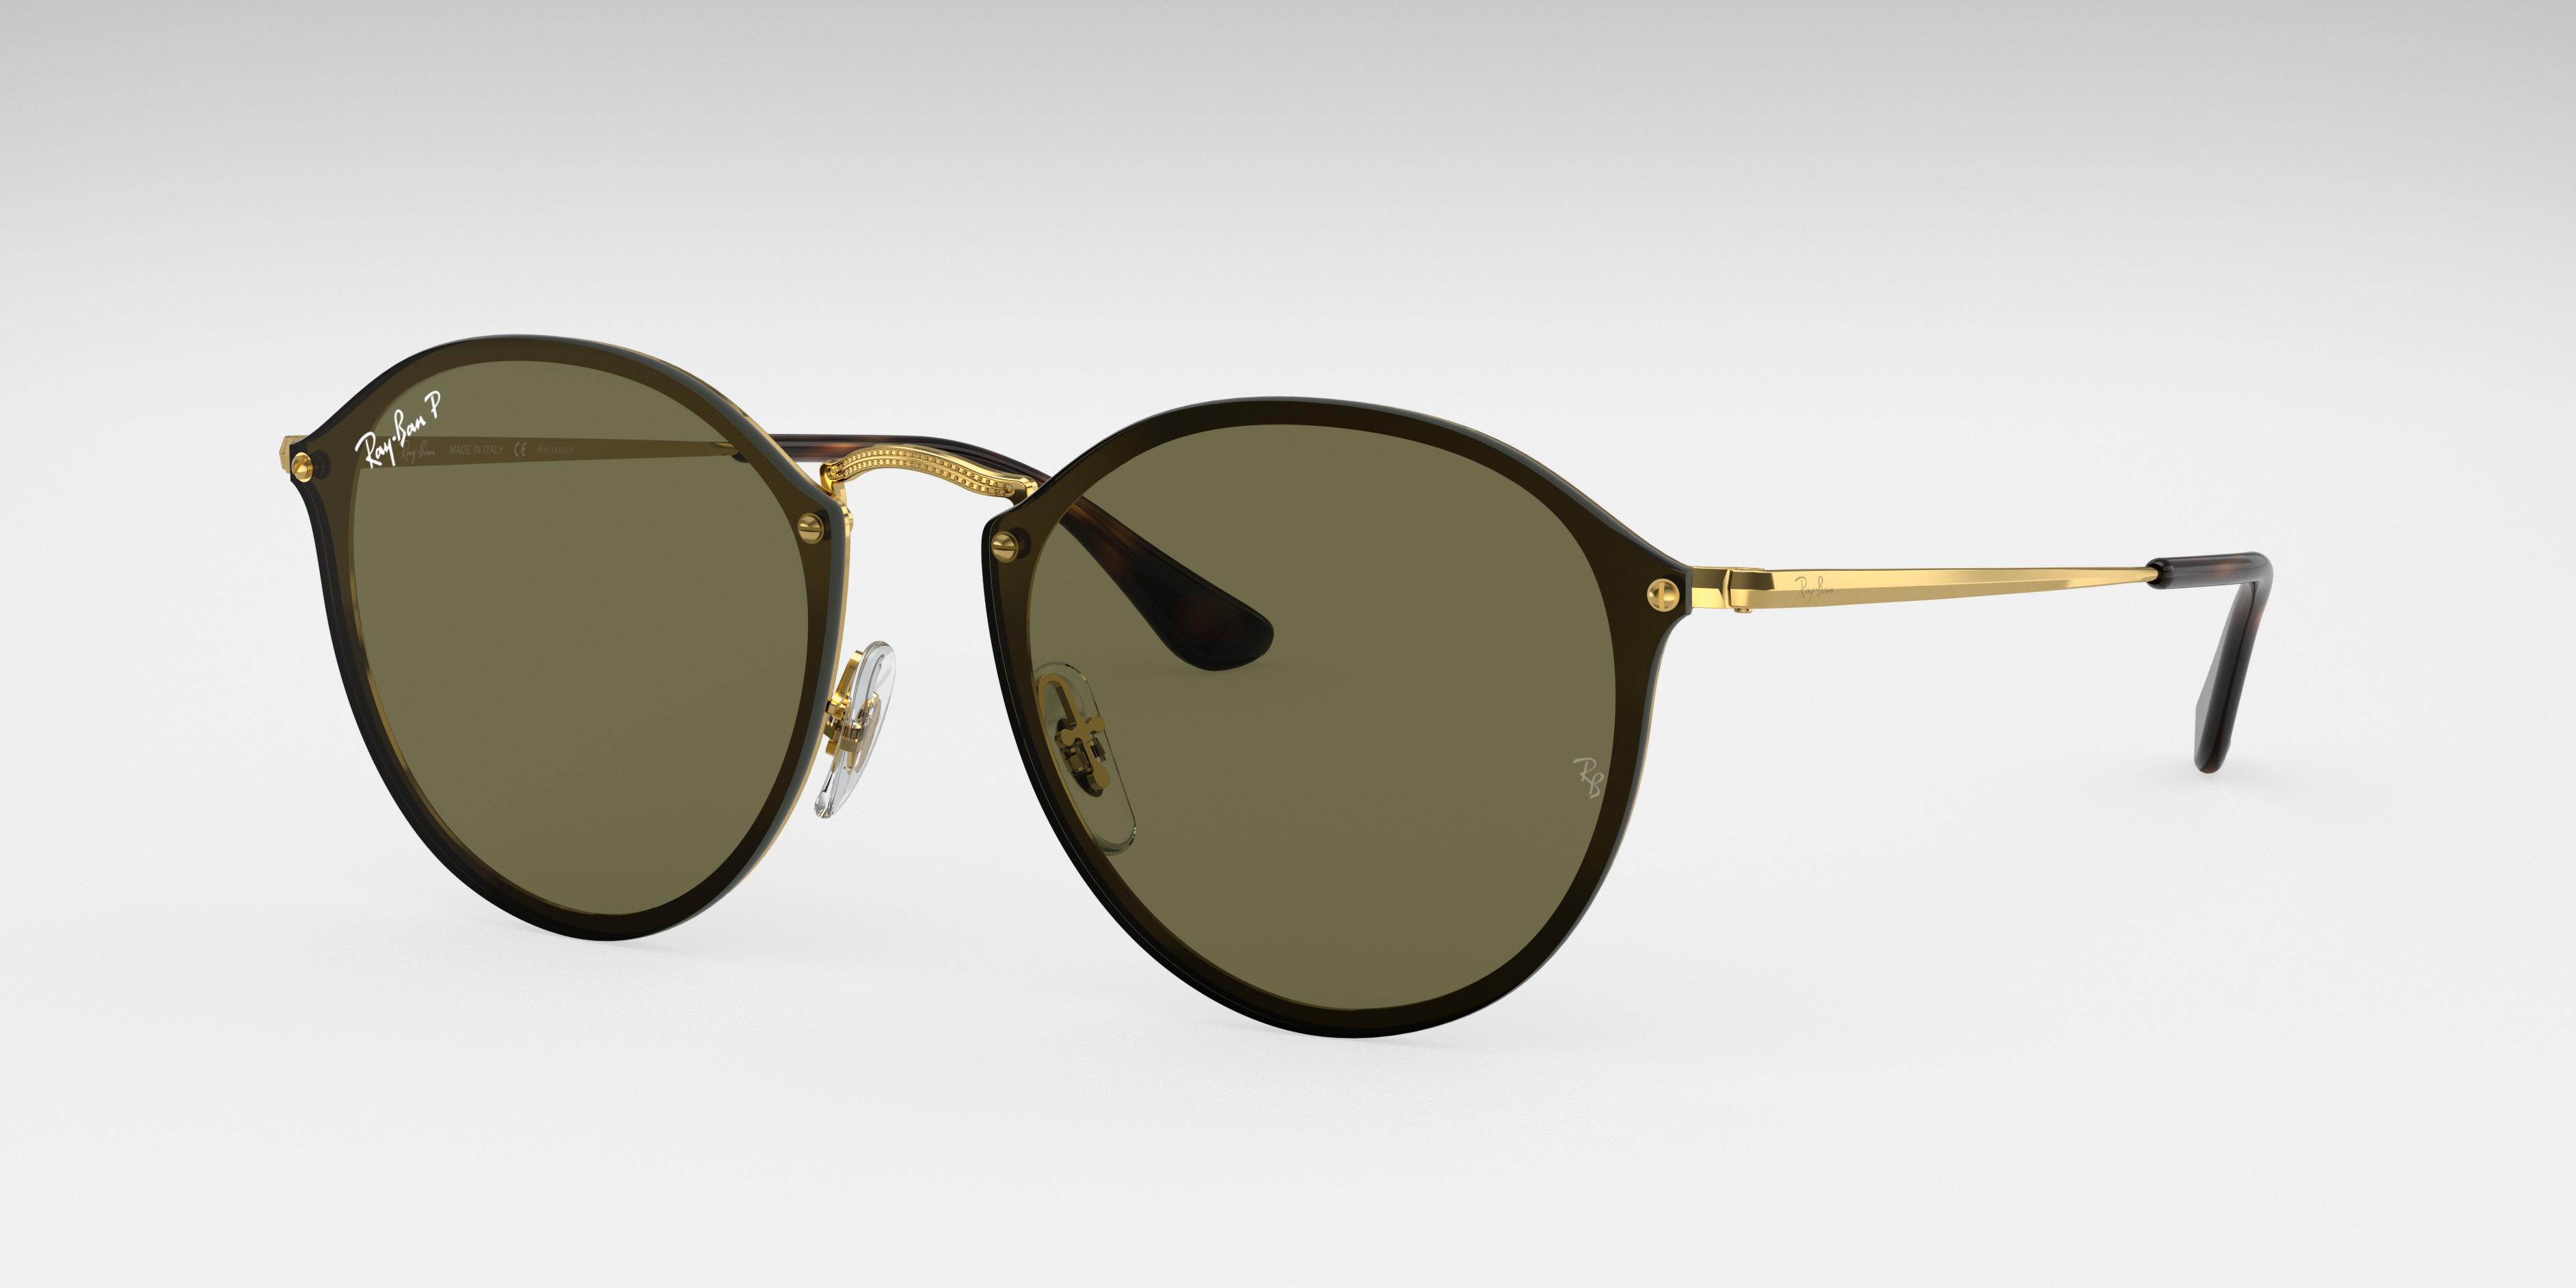 Ray-Ban Blaze Round Gold, Polarized Green Lenses - RB3574N